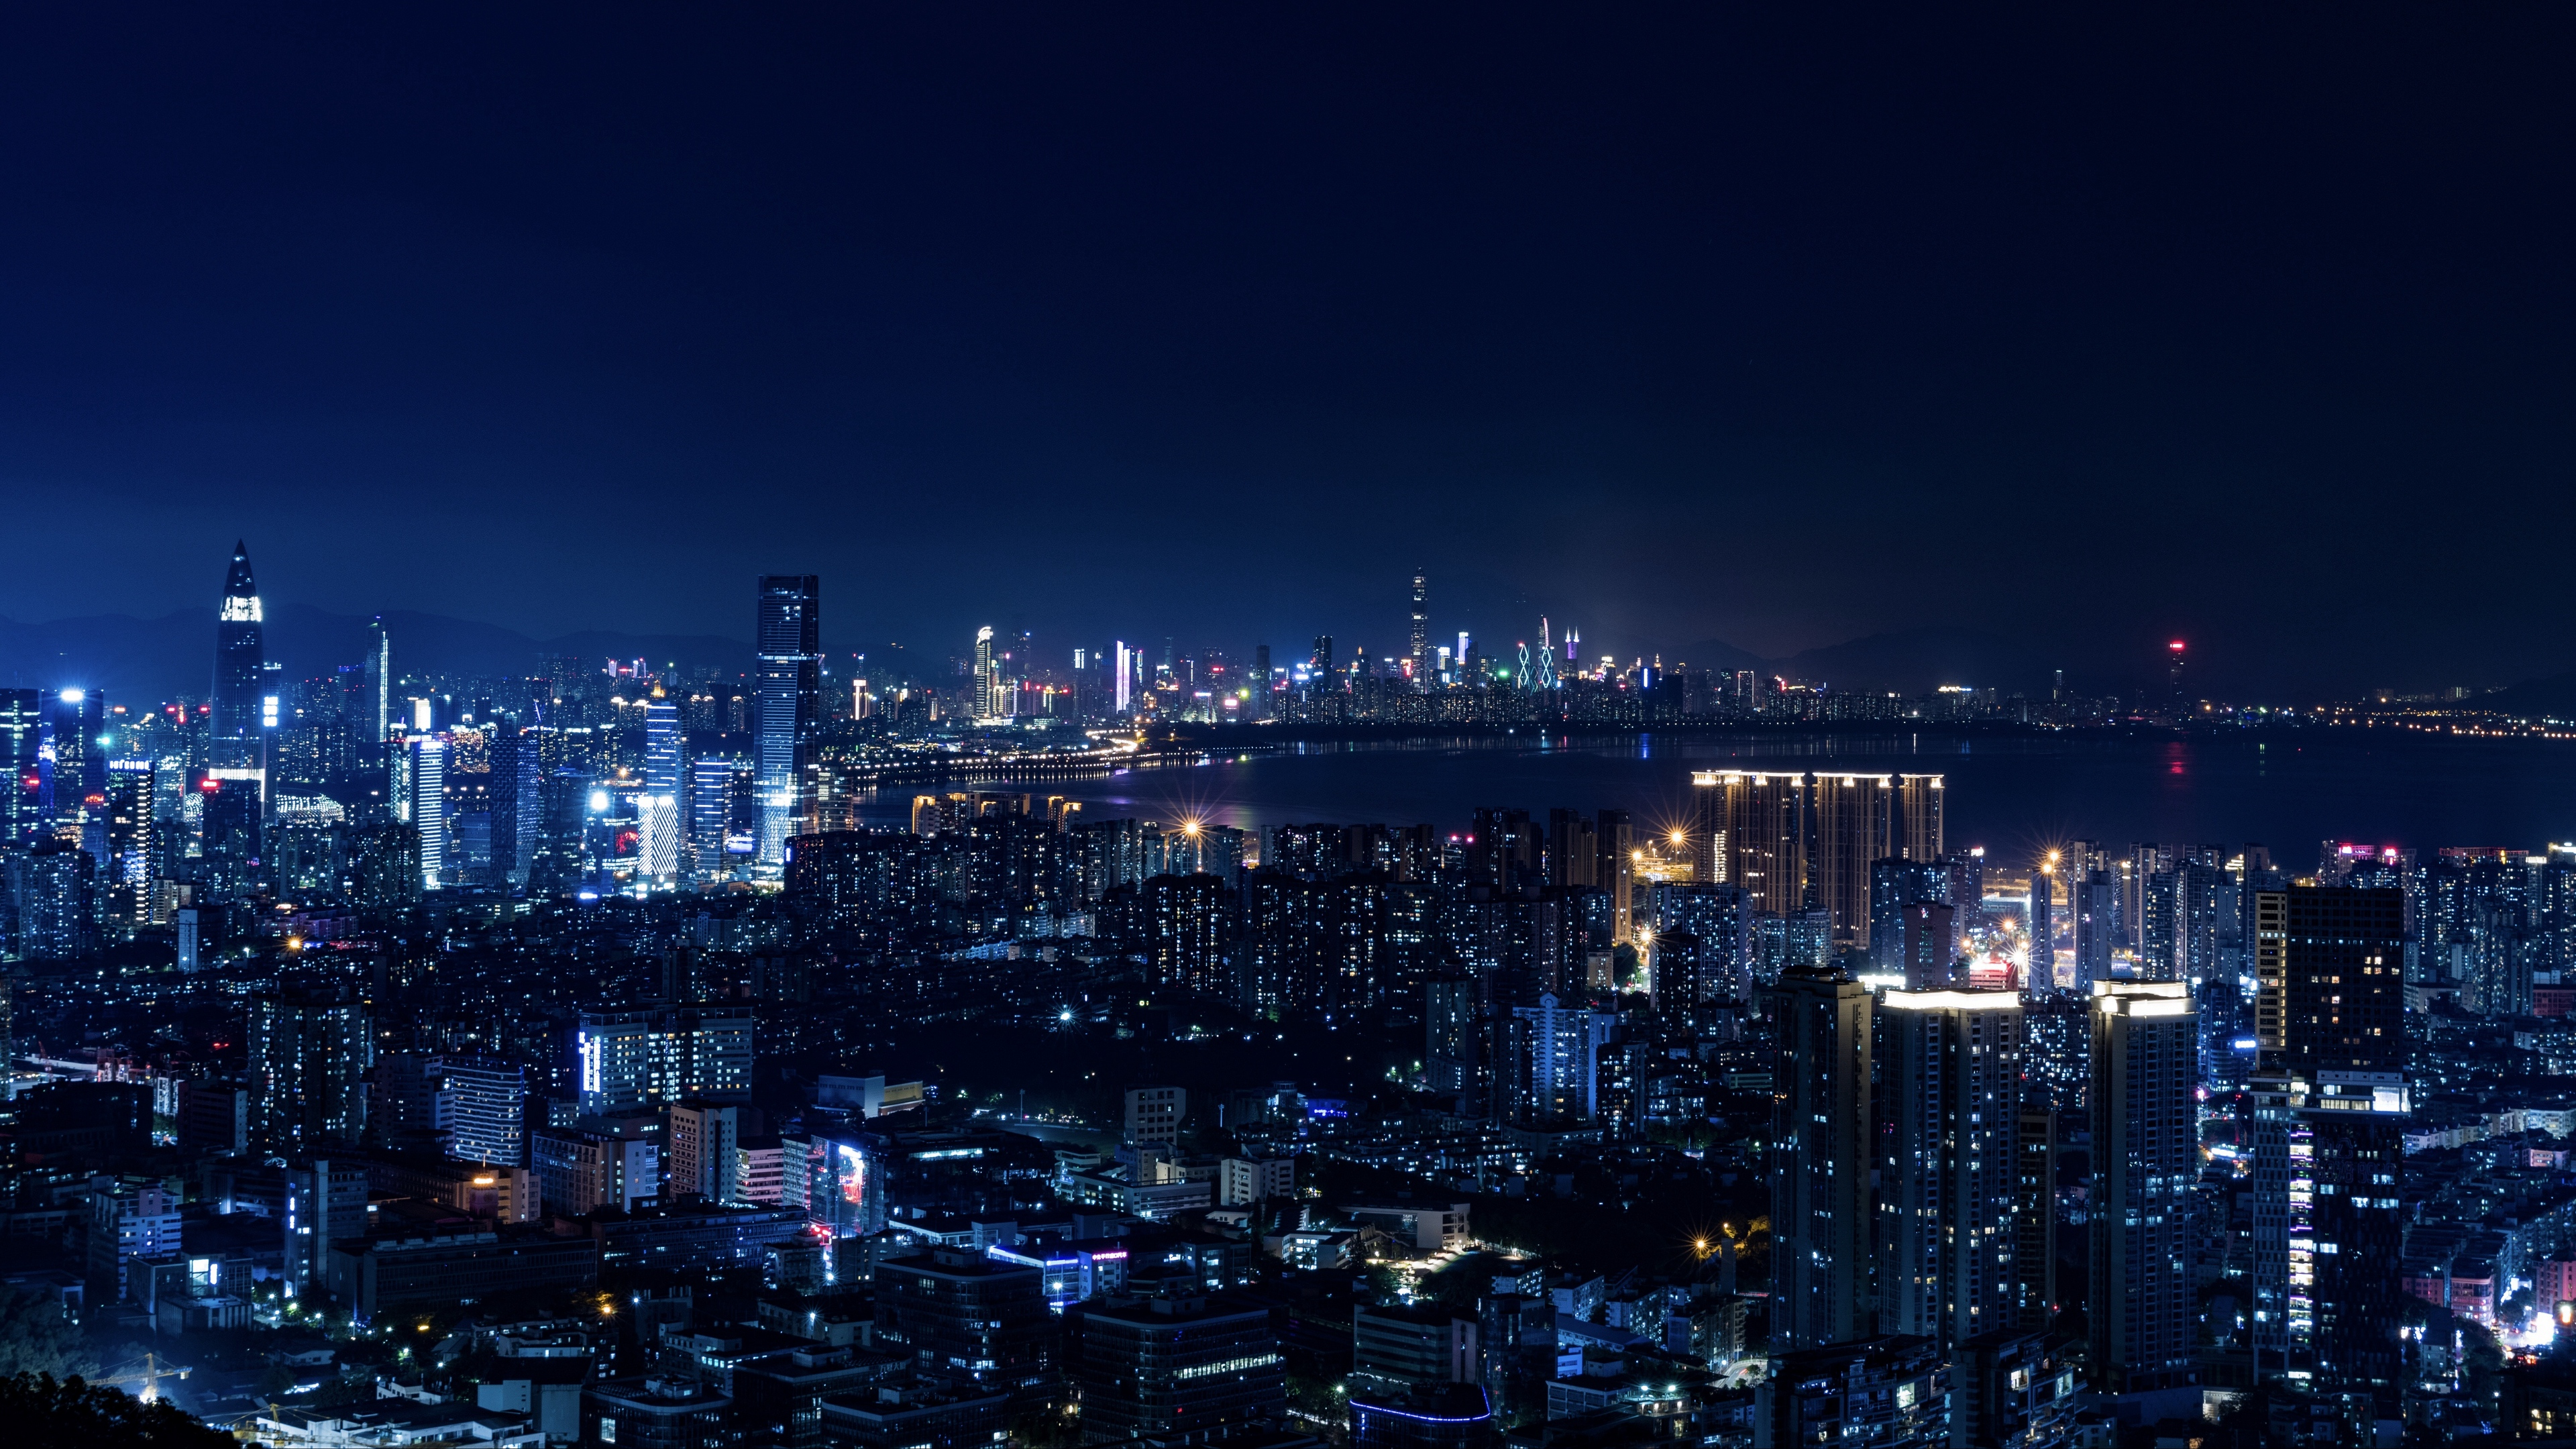 night city city lights metropolis night 4k 1538067561 - night city, city lights, metropolis, night 4k - night city, metropolis, city lights